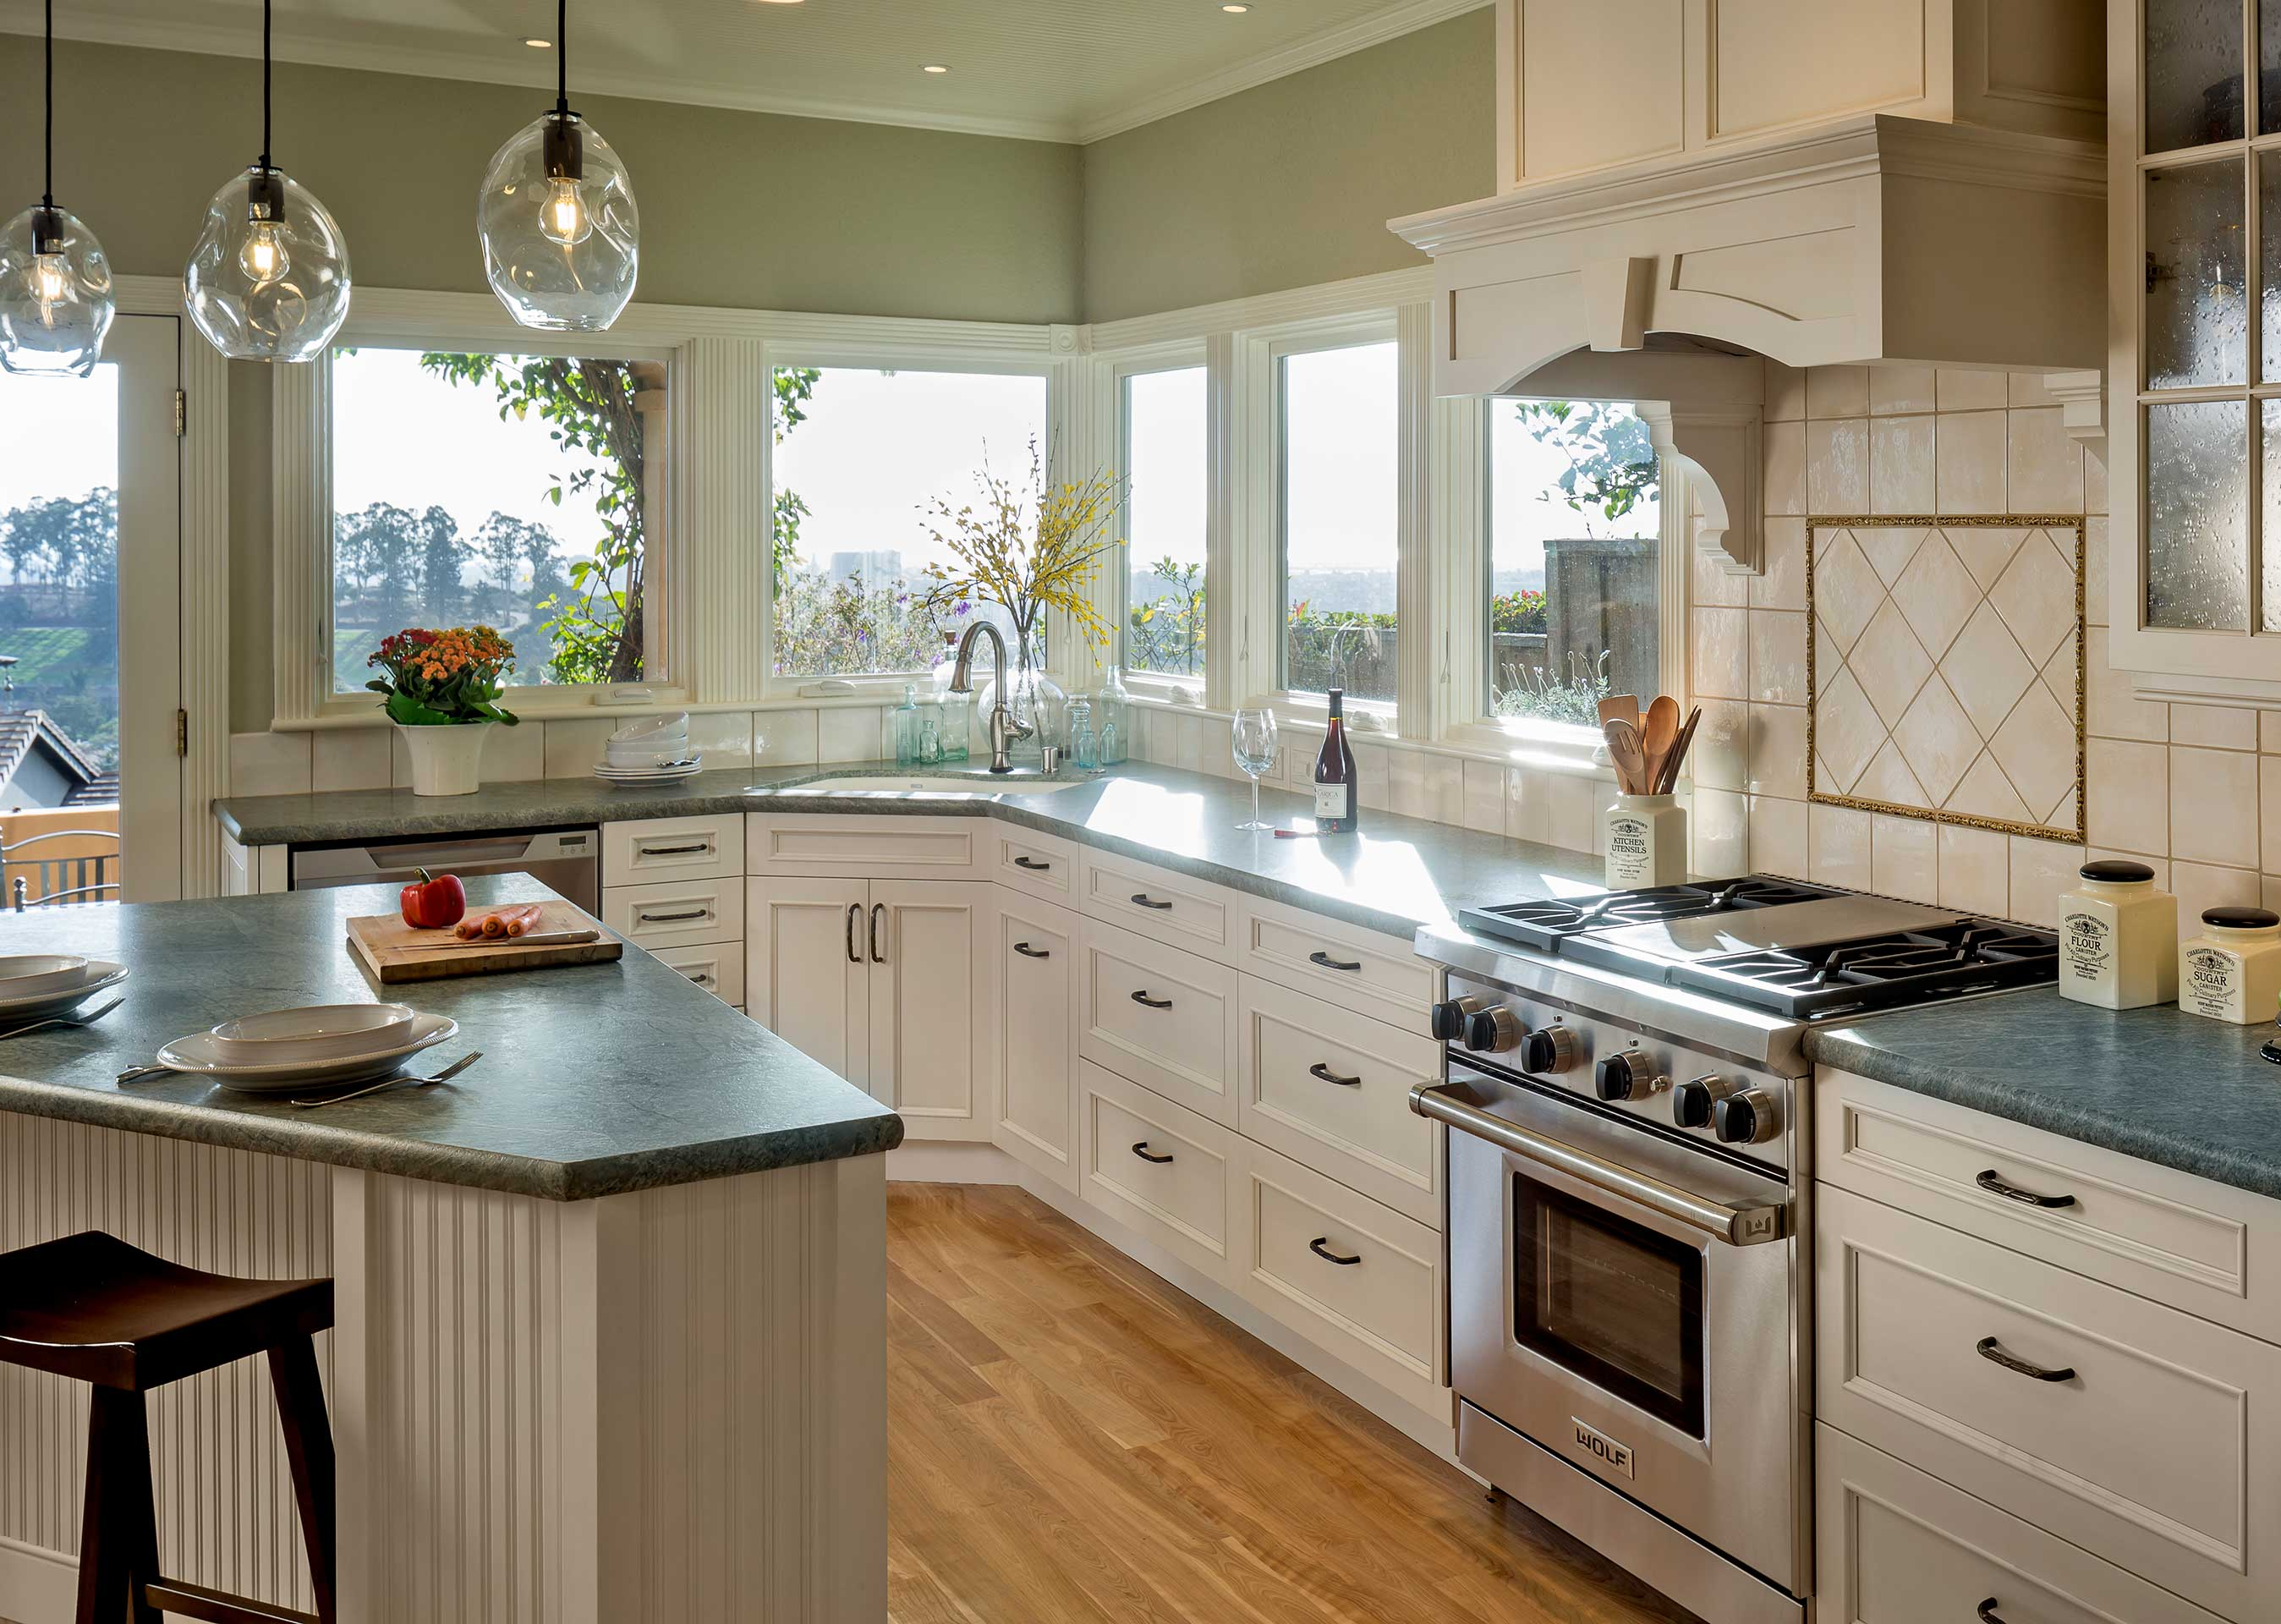 Custom kitchens by john wilkins - Reviews